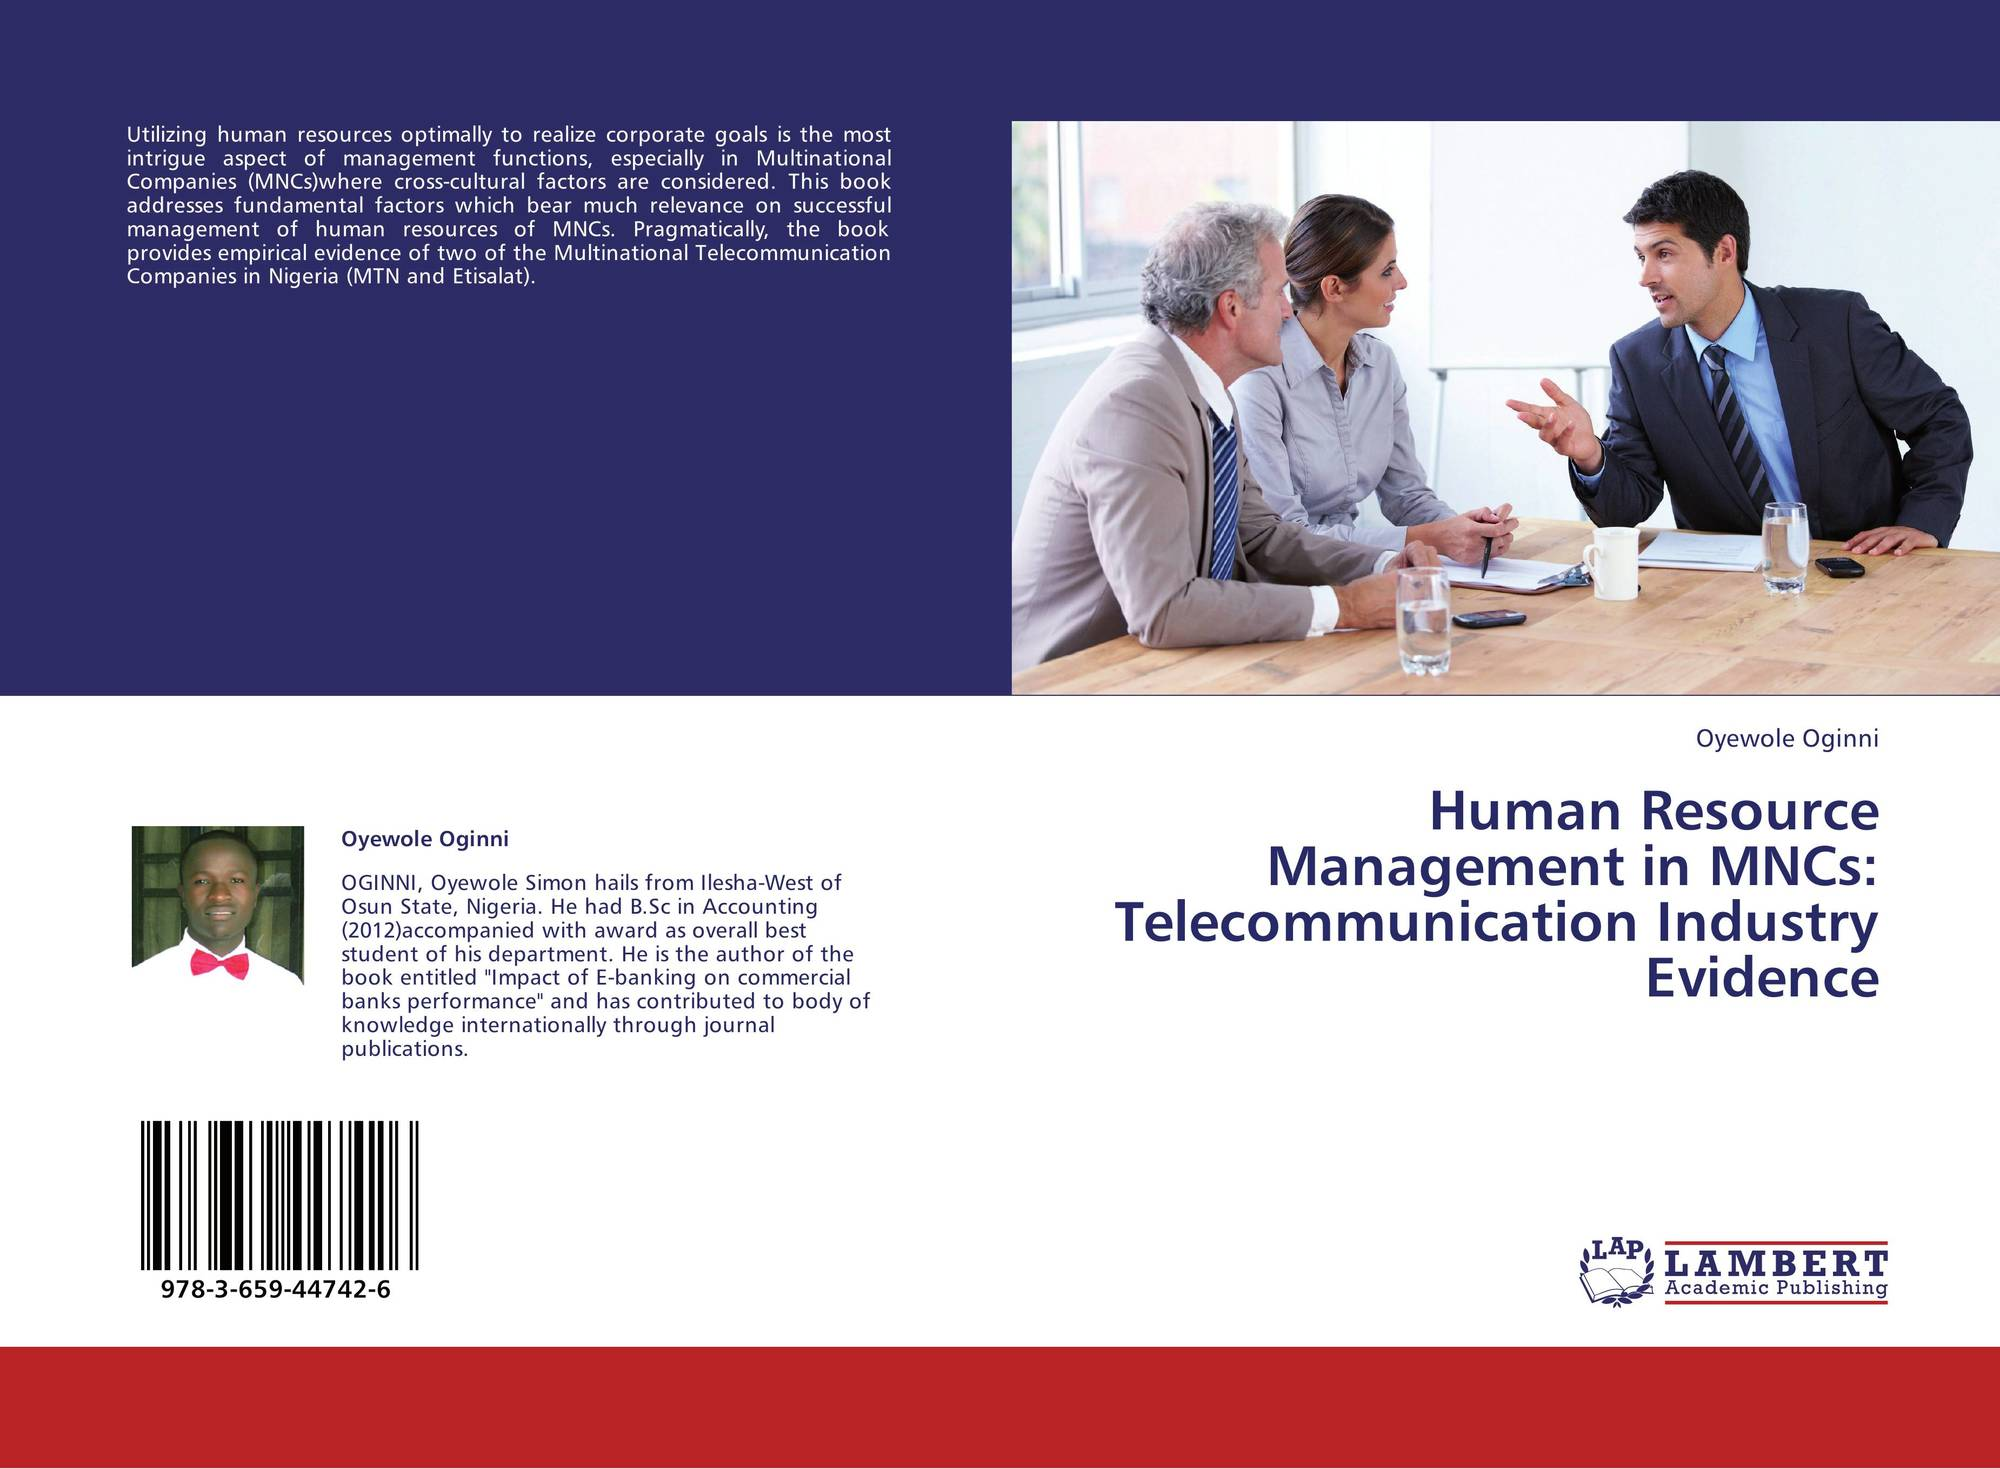 Technology Management Image: Human Resource Management In MNCs: Telecommunication